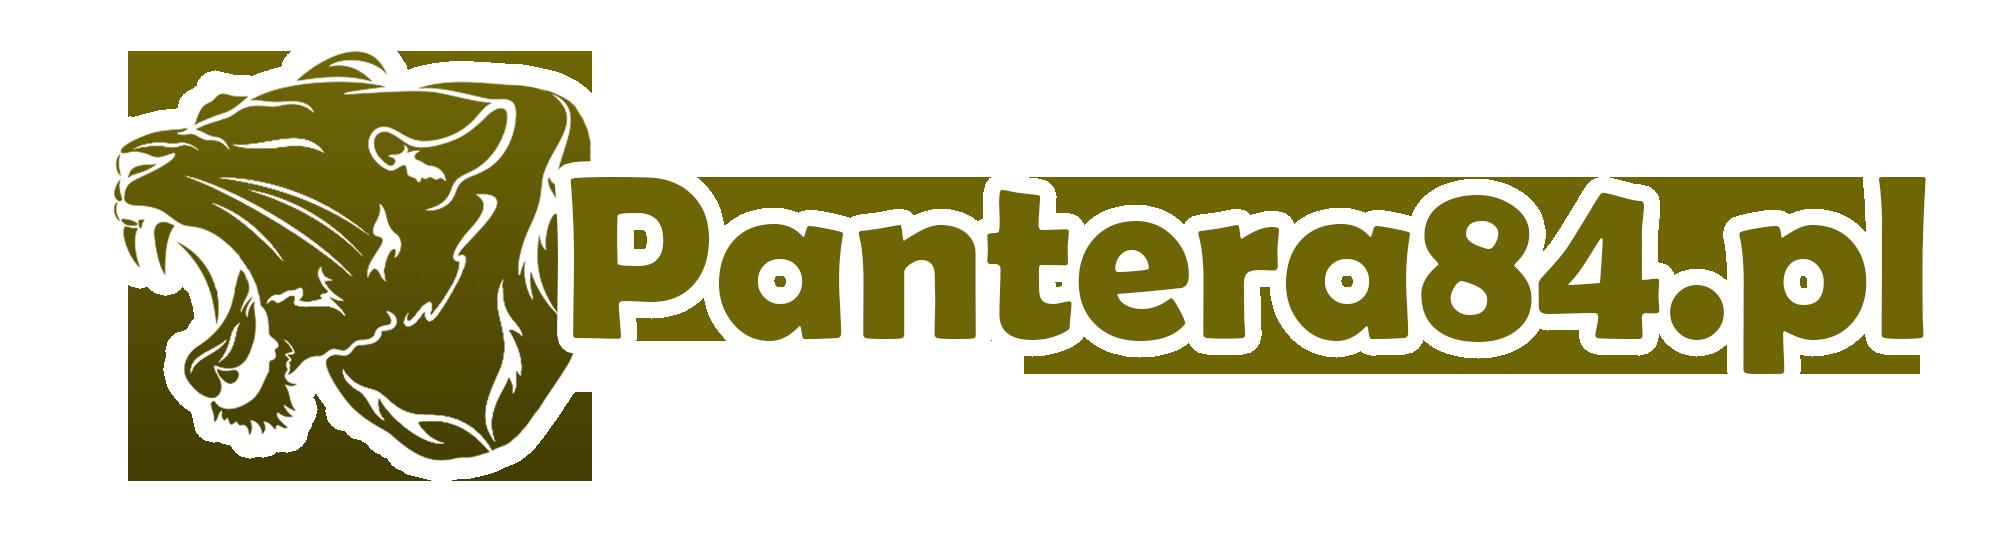 Pantera84.pl